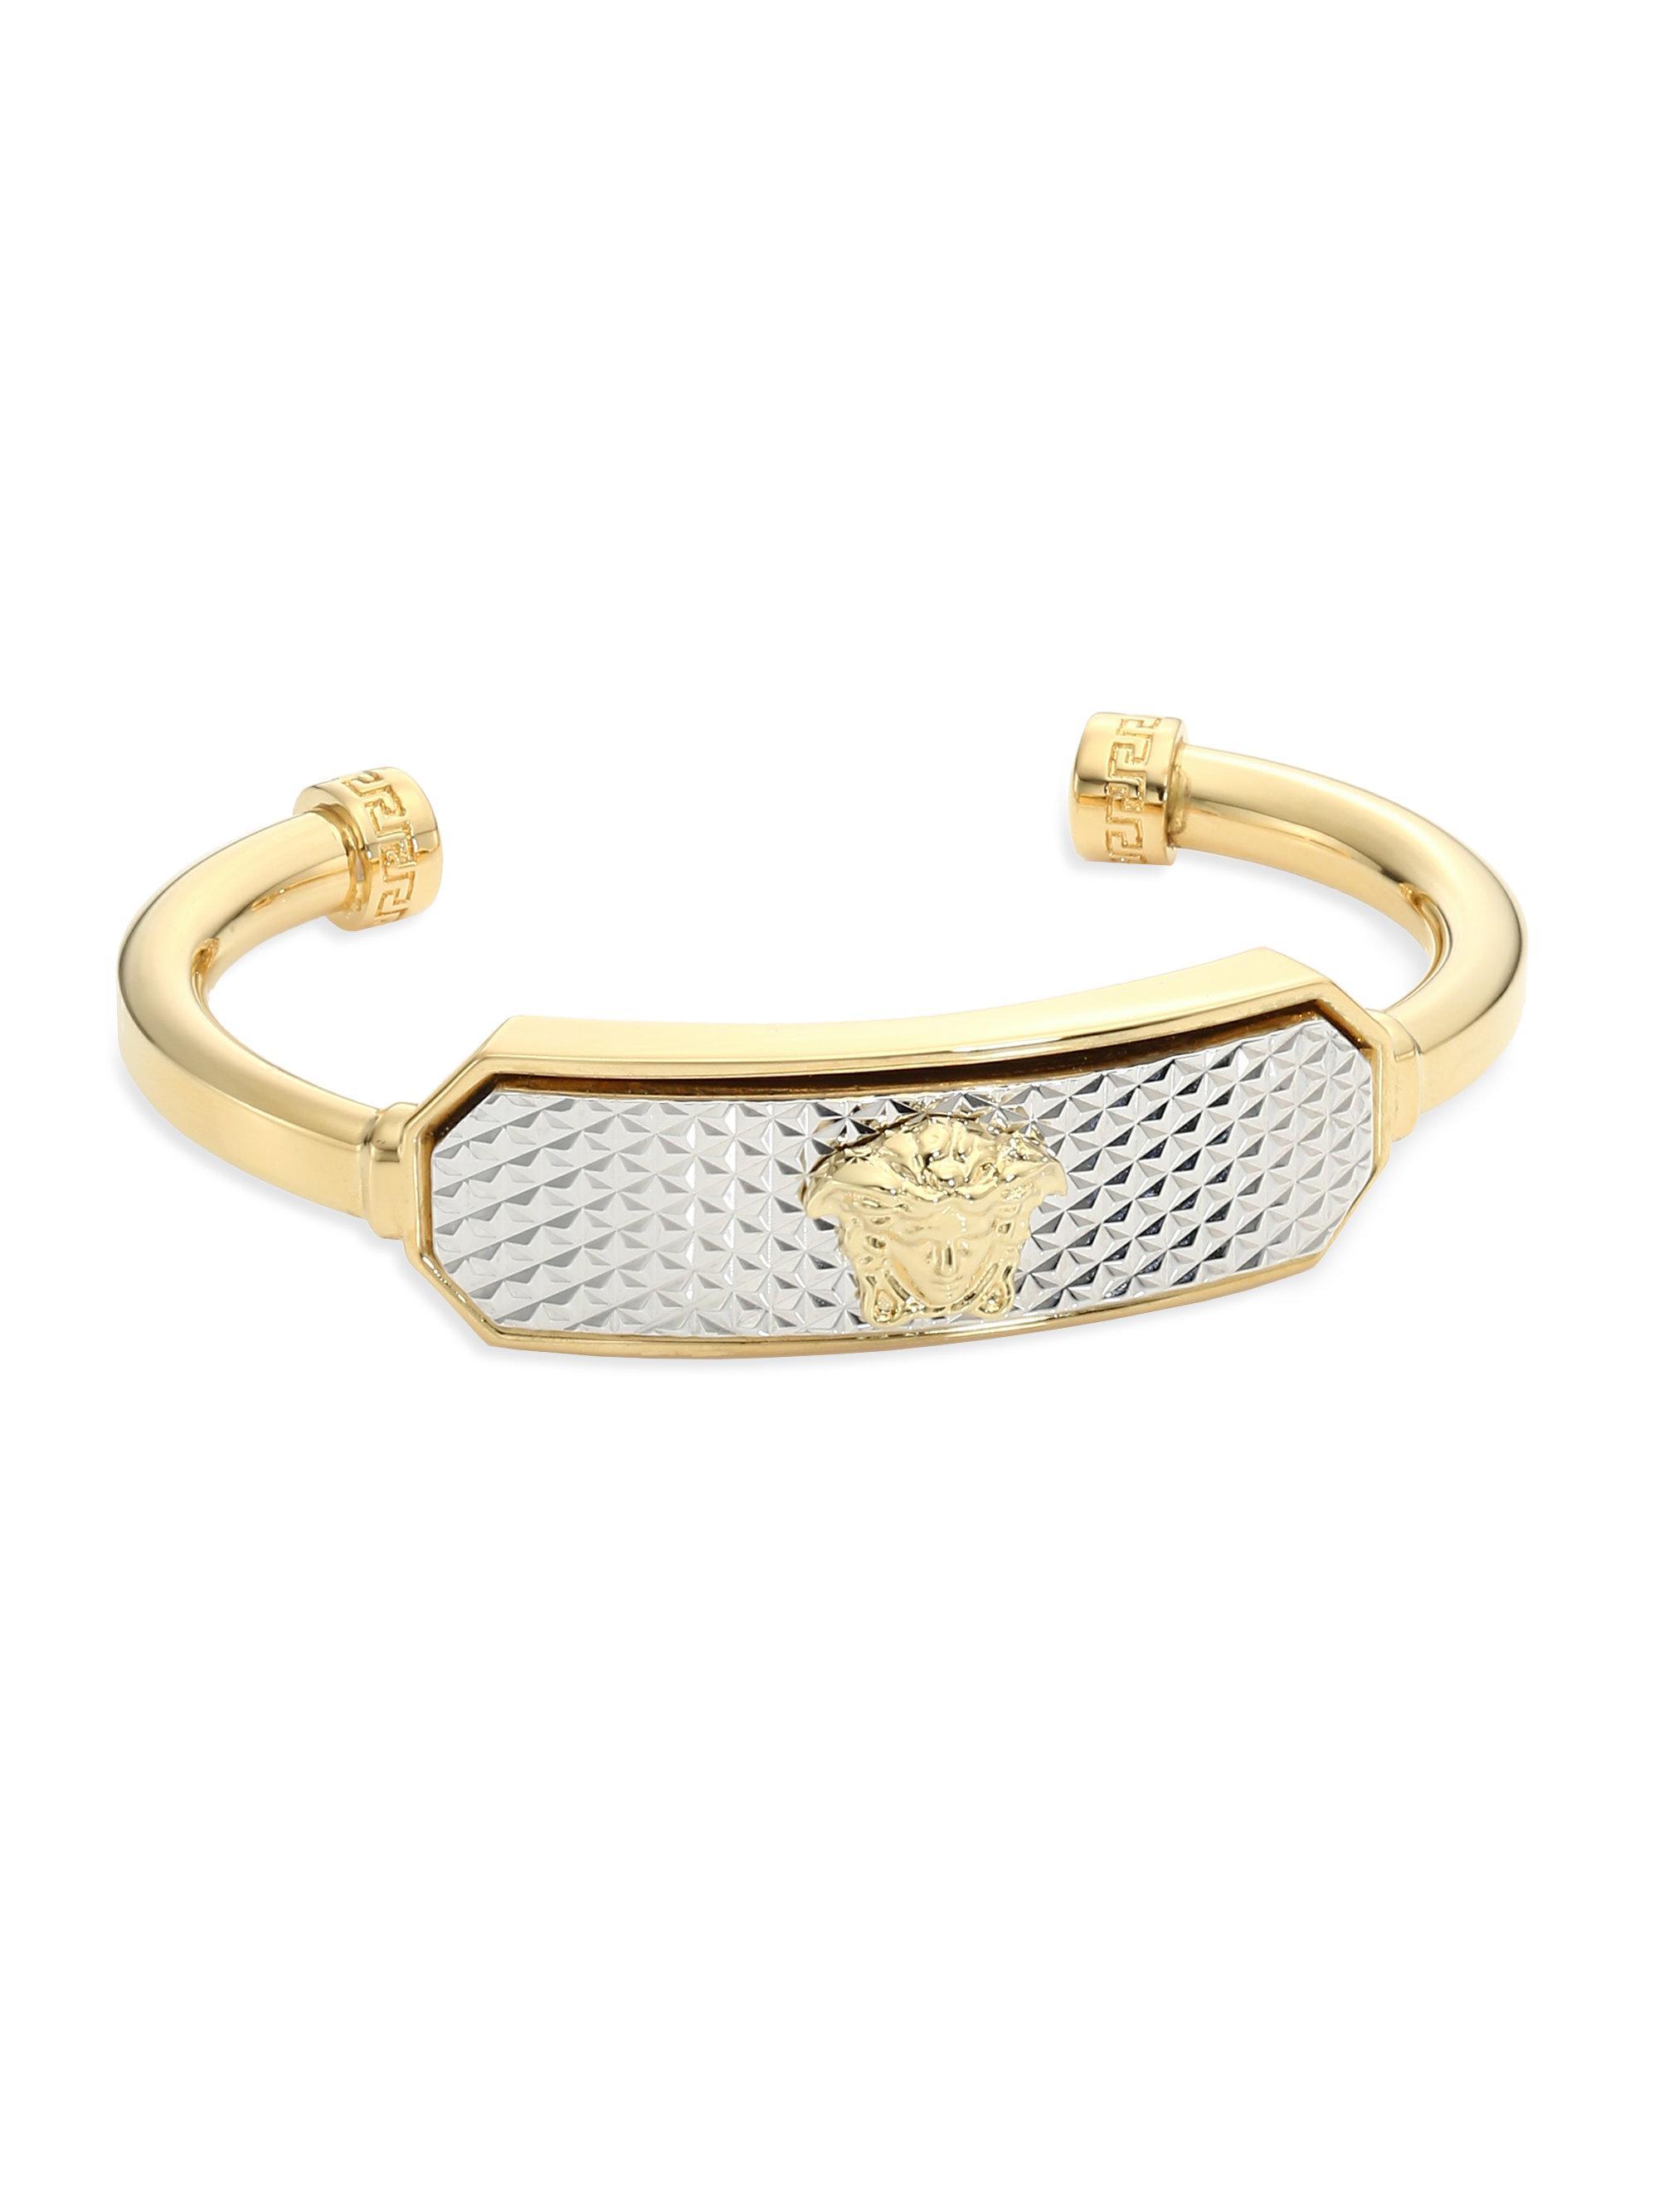 Versace Logo Bracelet in Gold Metal PQnDI